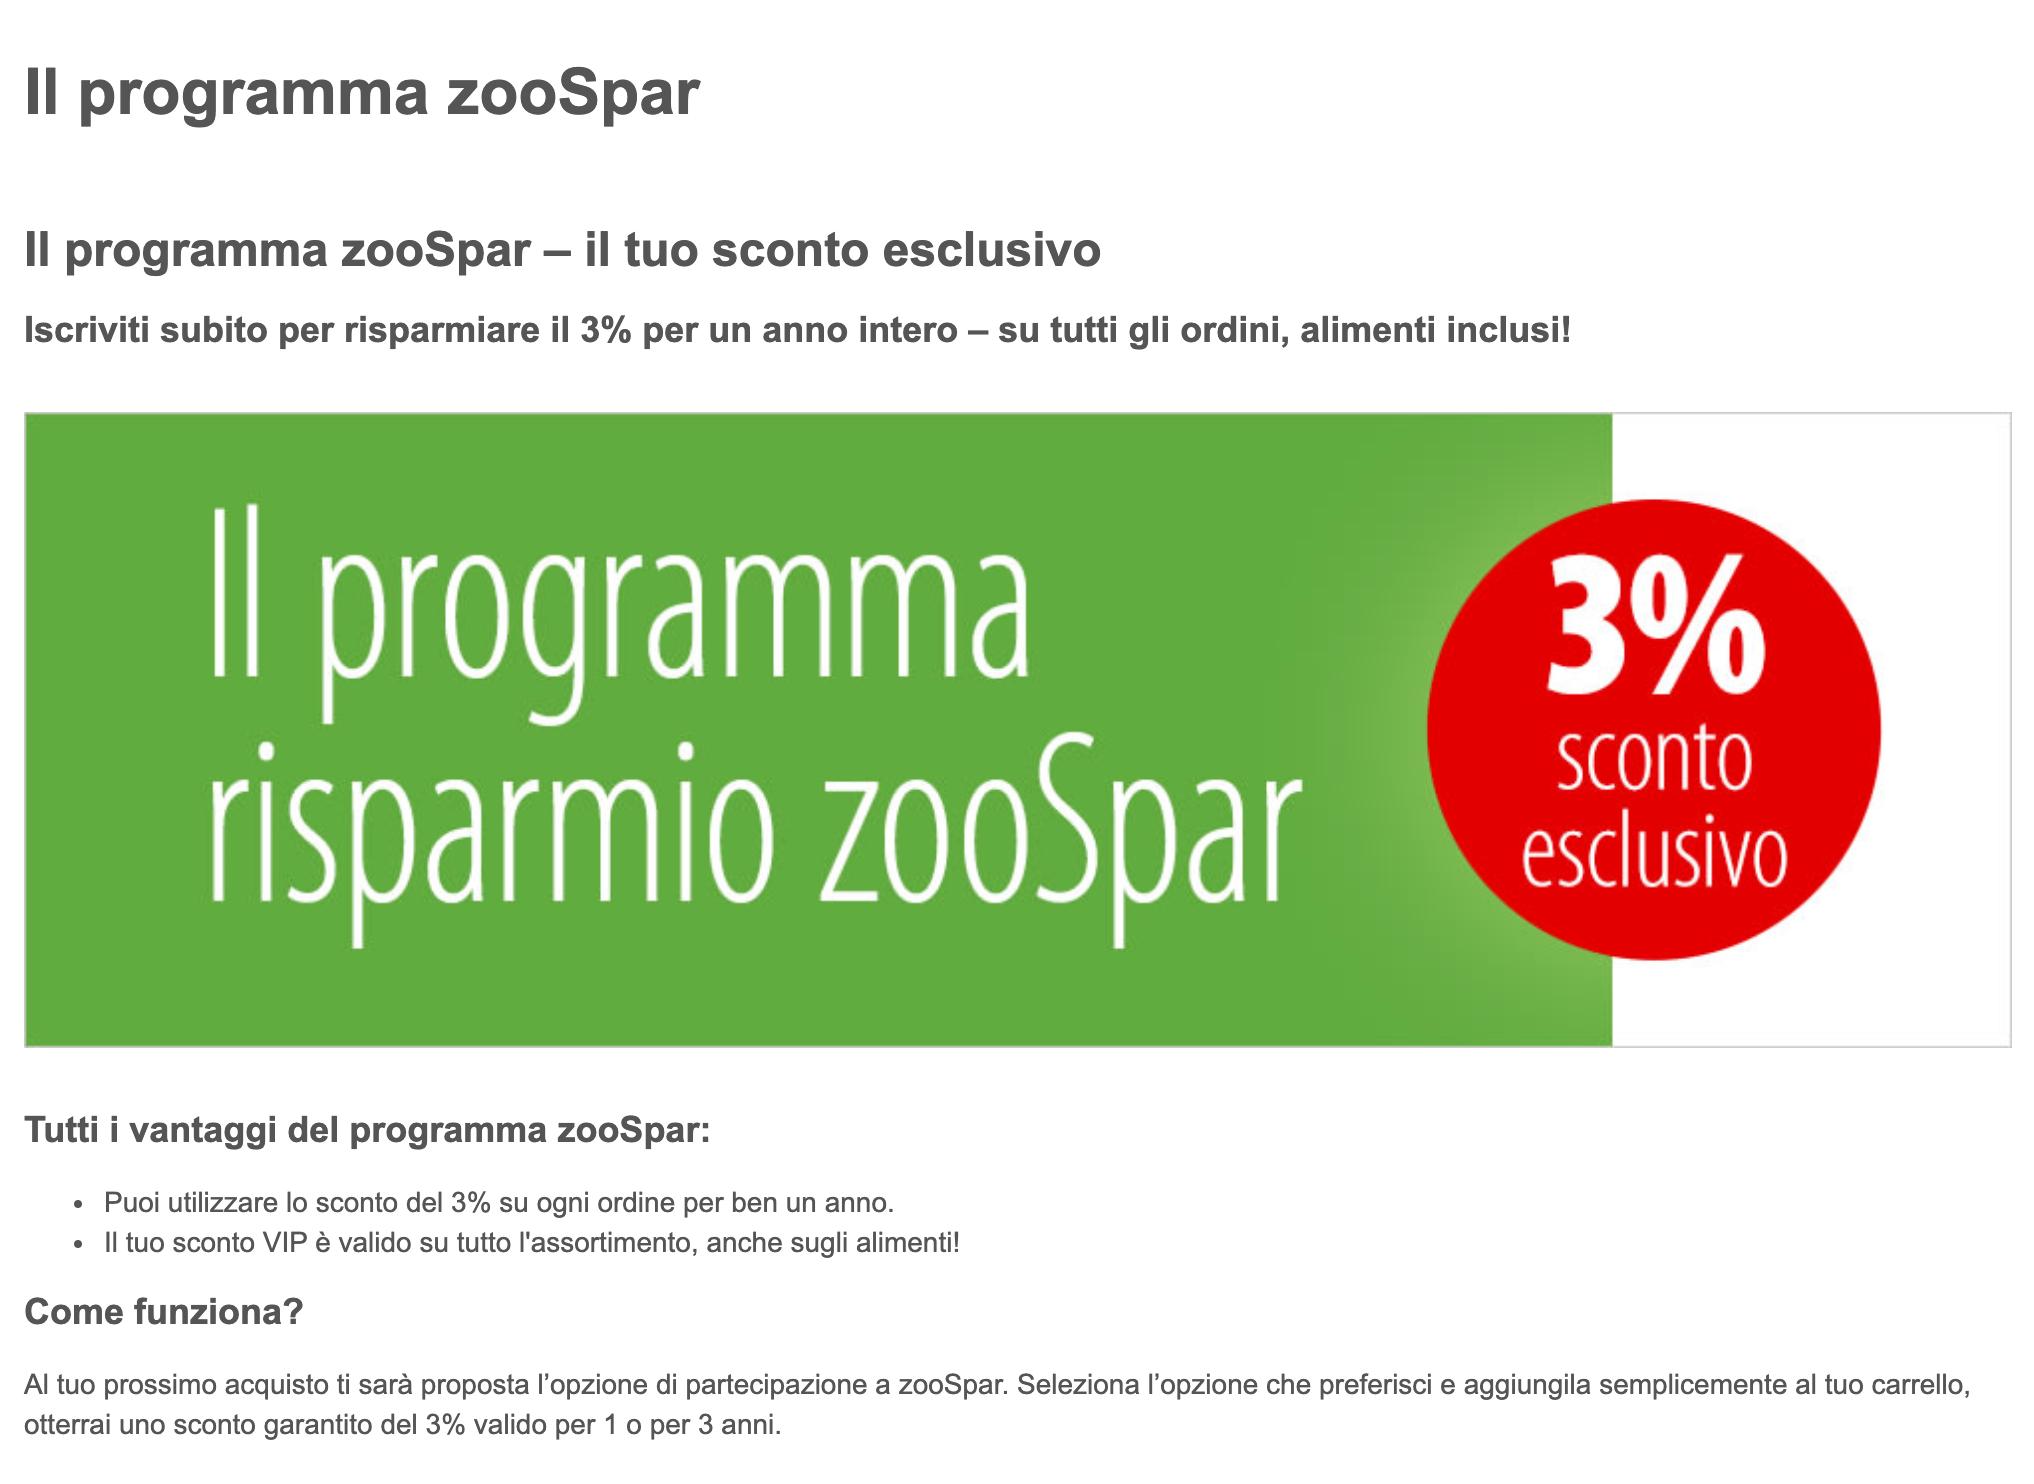 zooplus-programma-zooSpar